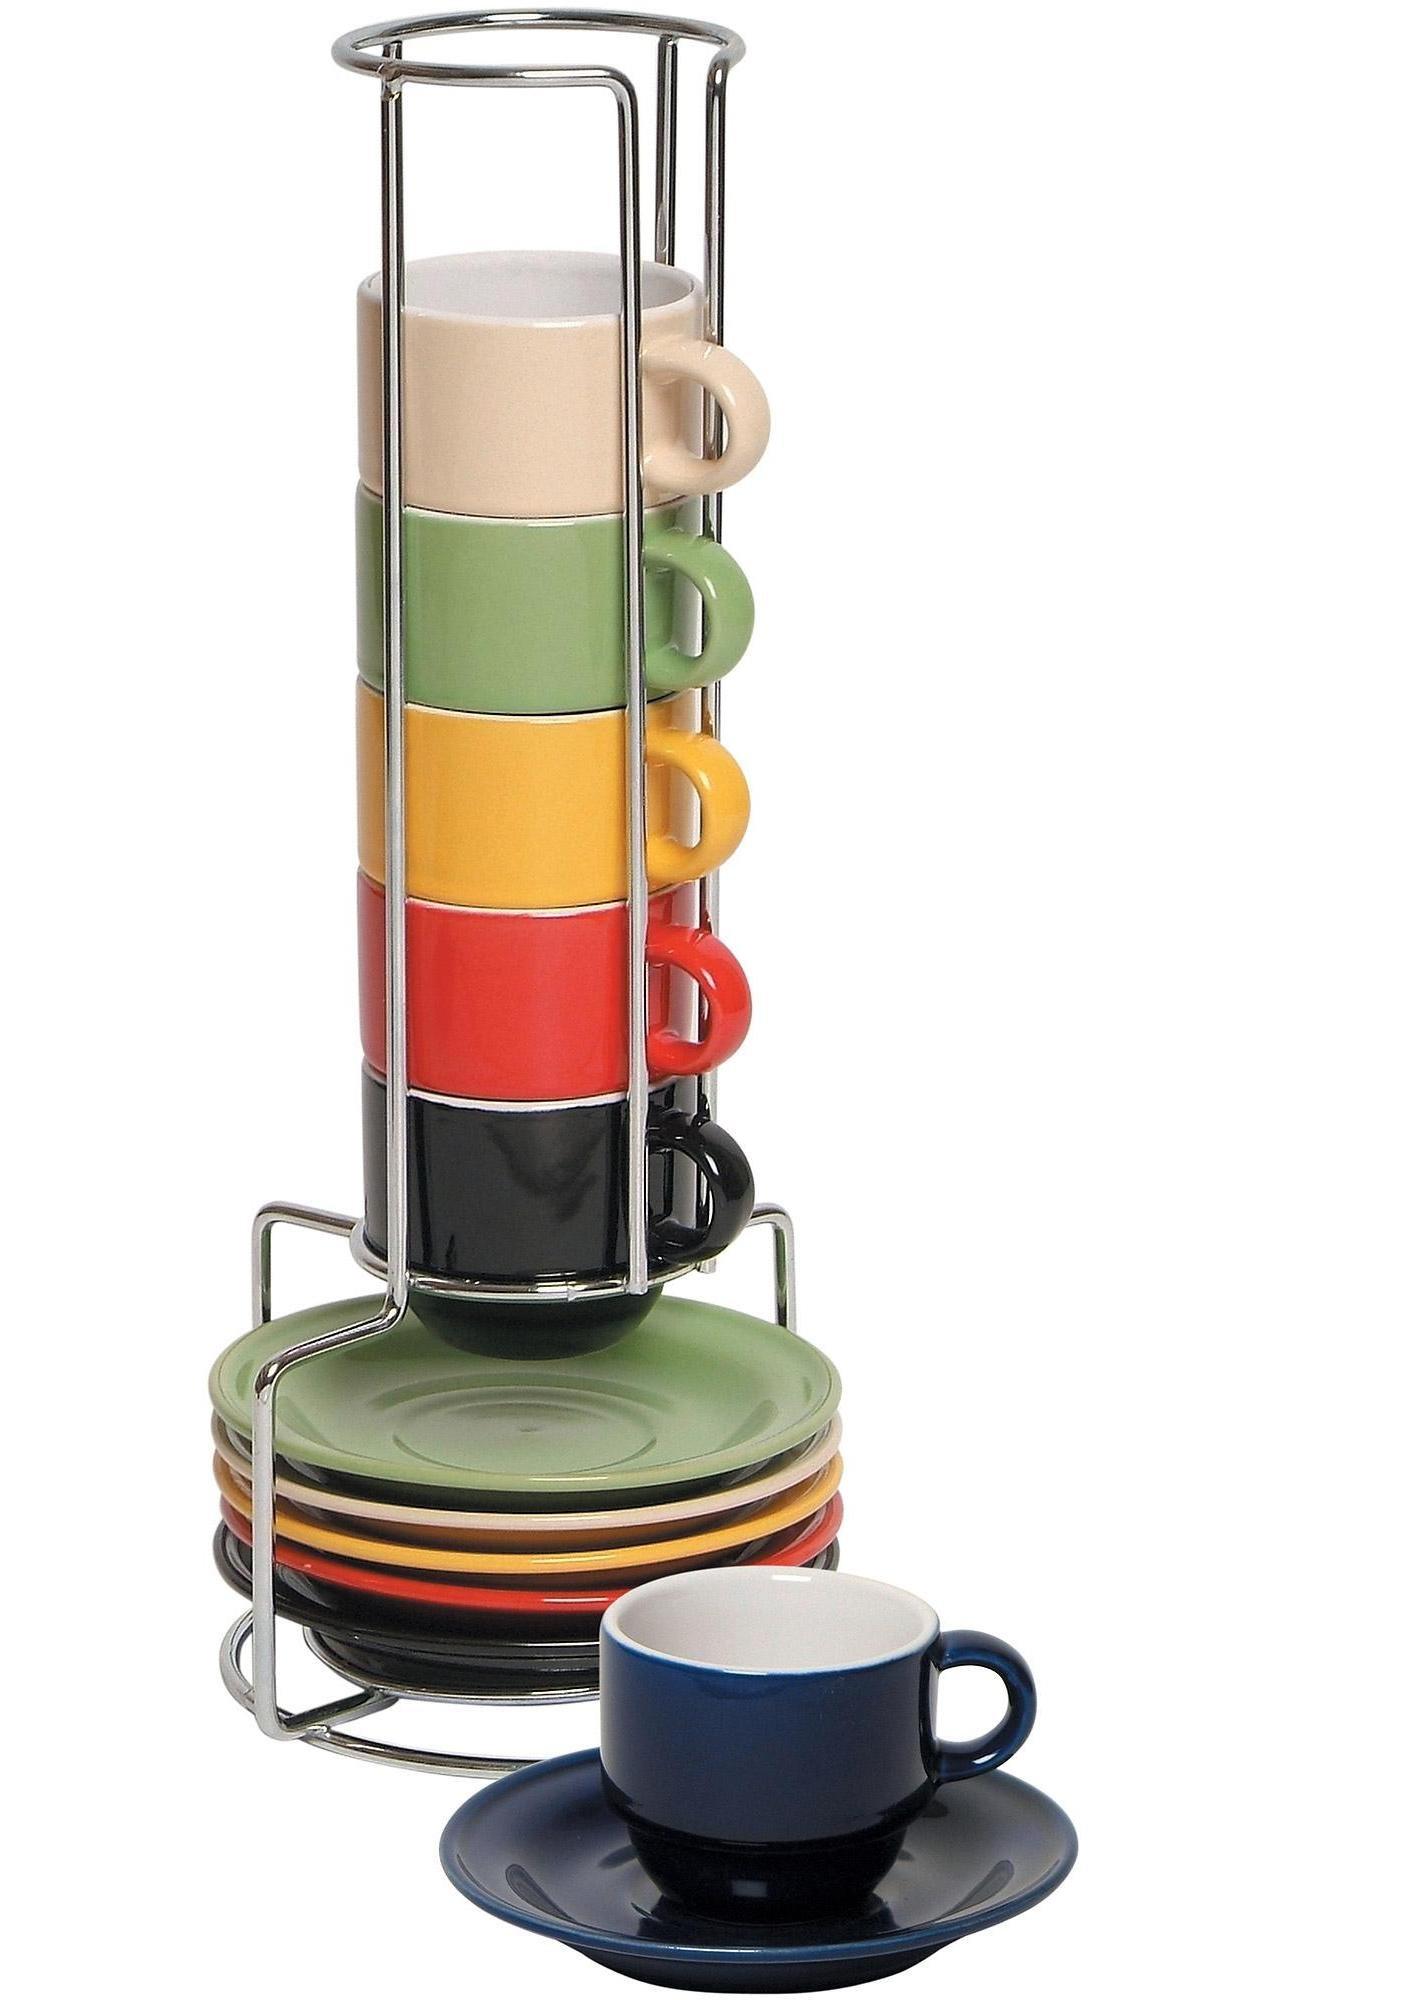 Stoneware Ceramic Espresso Cups Set - 13 Pc Colorful Stacking Espresso Cup and Saucer Set w/Rack